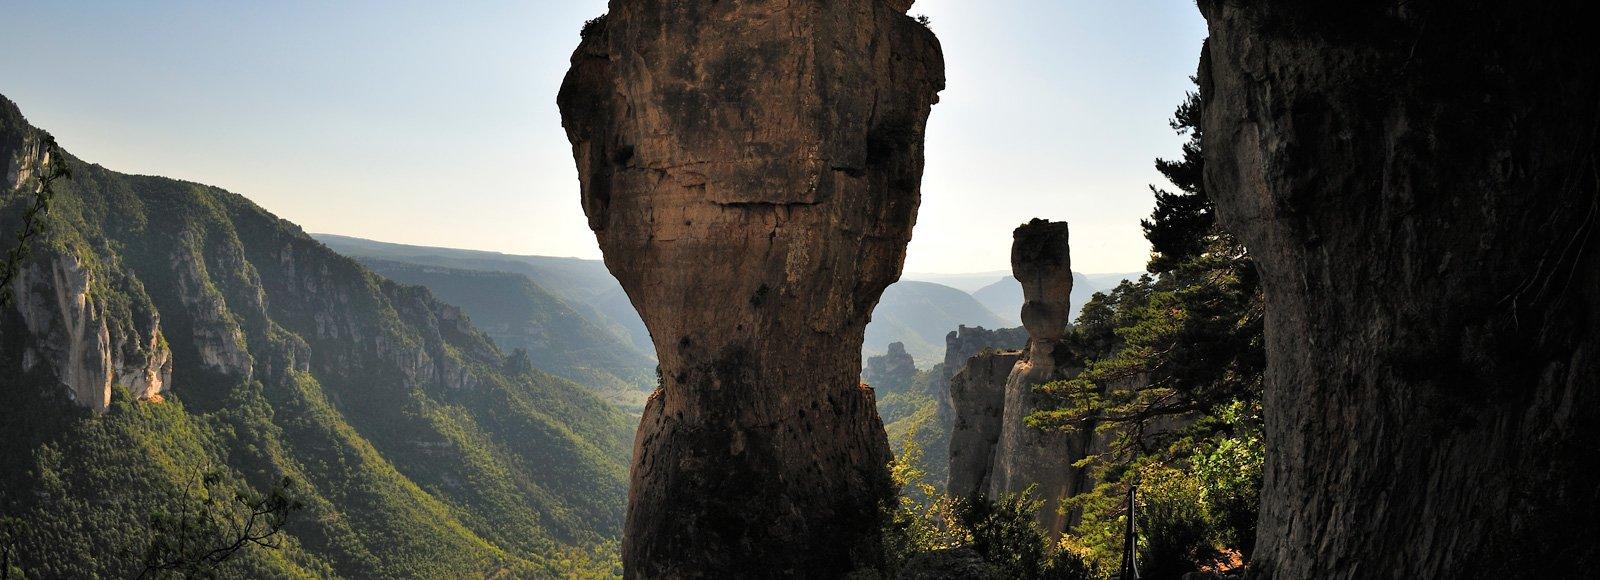 Gorges in Frankrijk